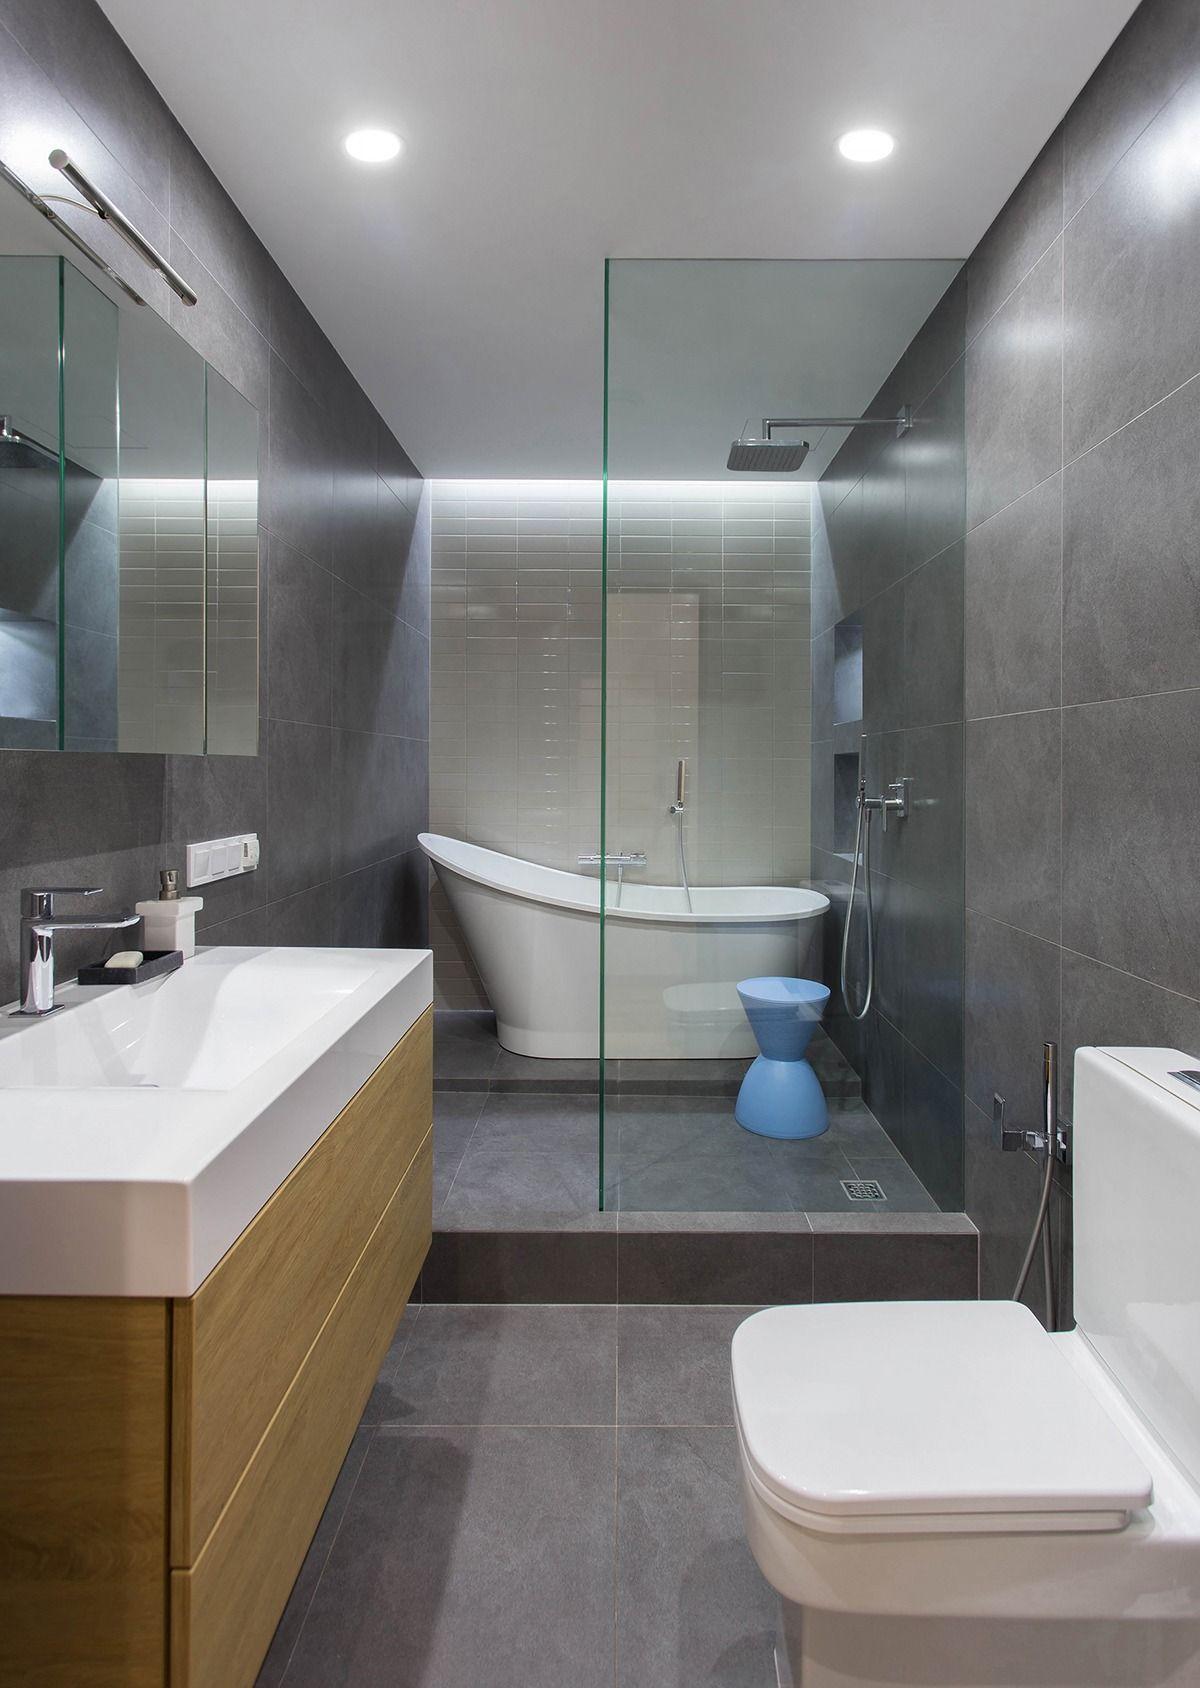 Departamentos peque os para parejas con hijos incluimos for Planos de cuartos de bano pequenos